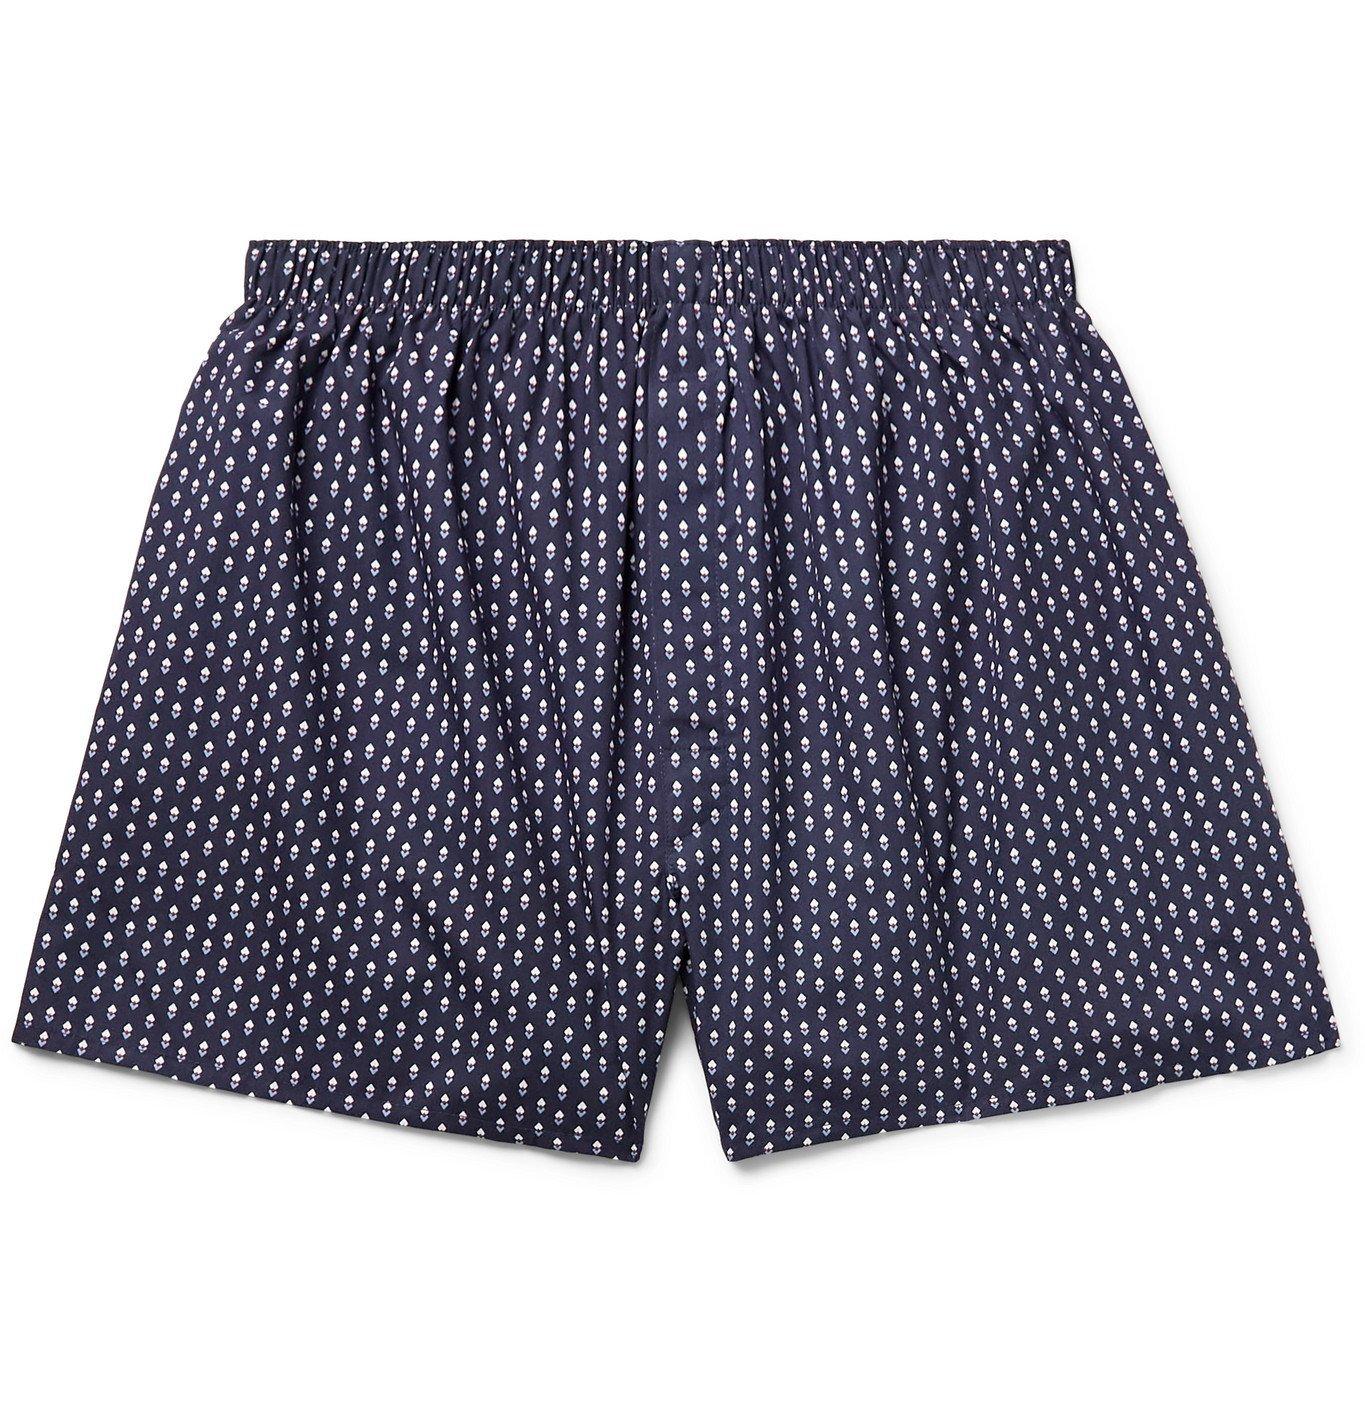 Sunspel - Printed Cotton Boxer Shorts - Blue